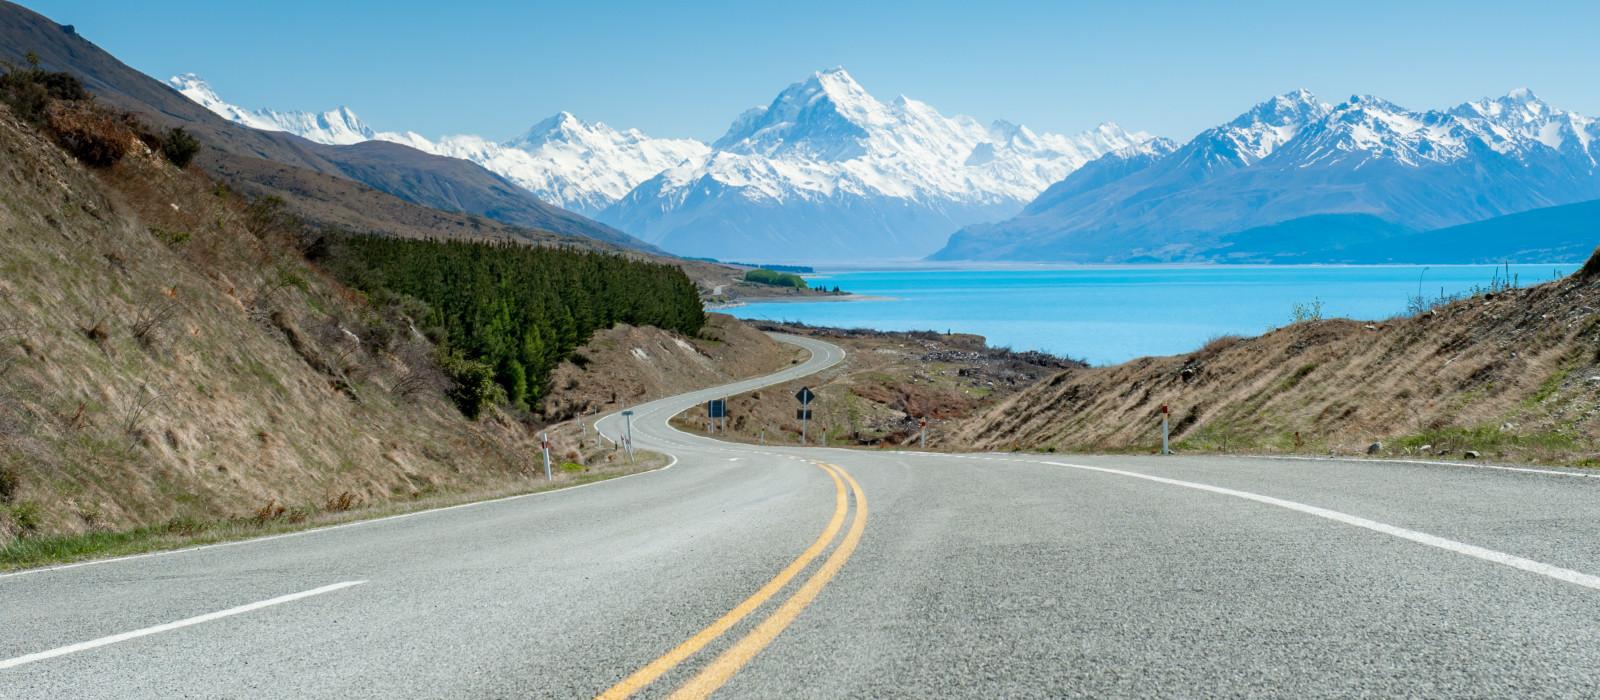 Destination Mount Cook New Zealand